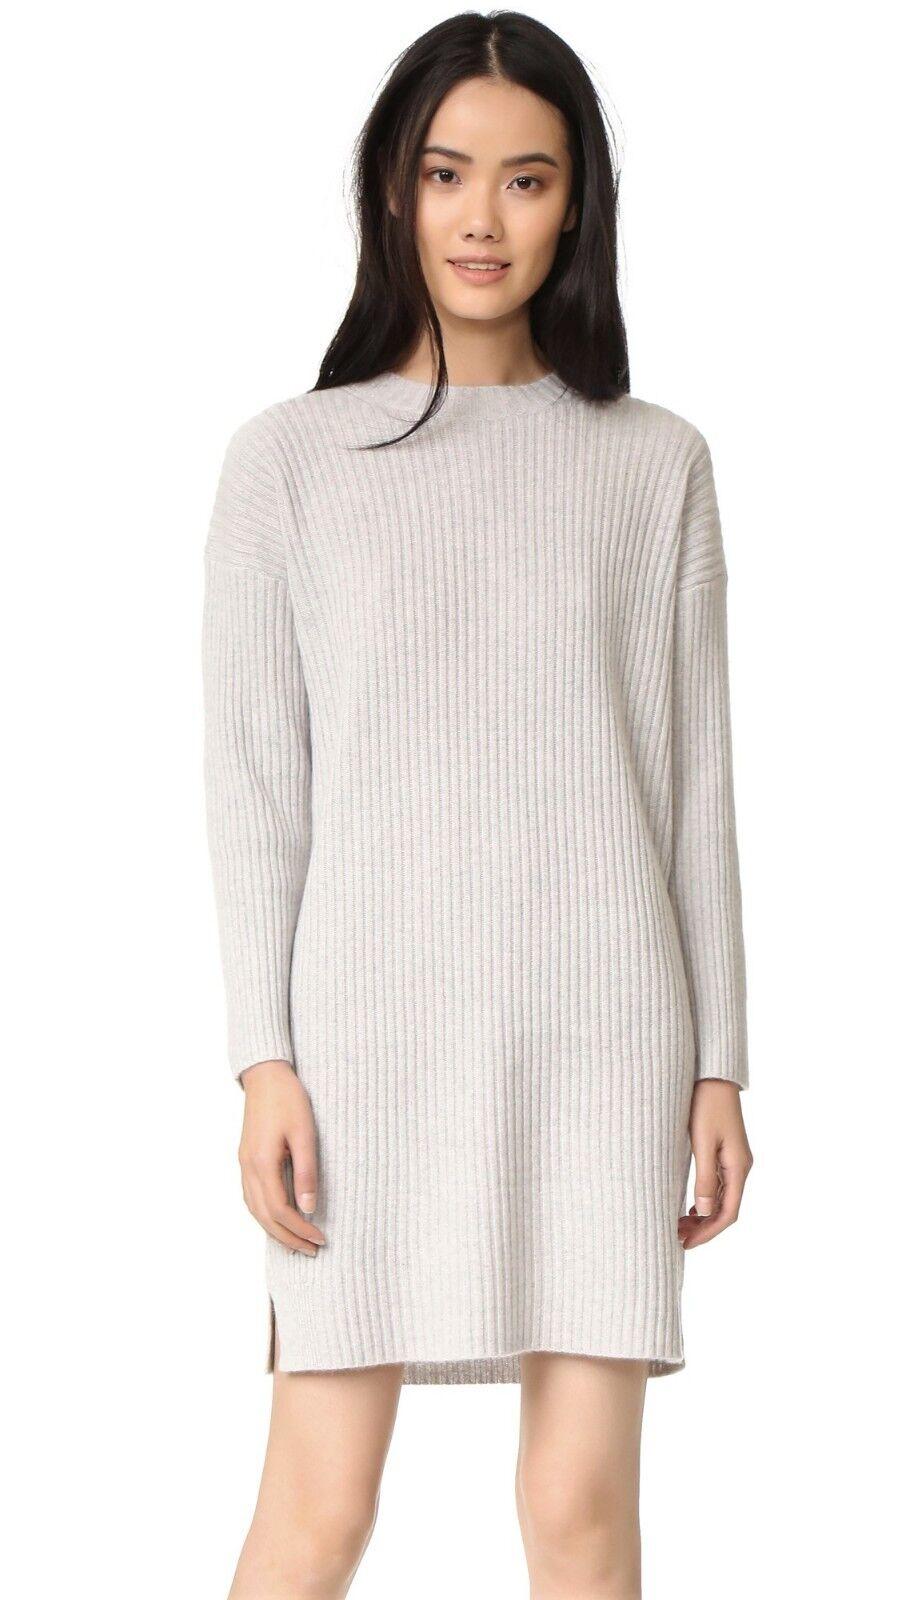 NWT 360 Cashmere Keegan Cashmere Dress Shitake Size M